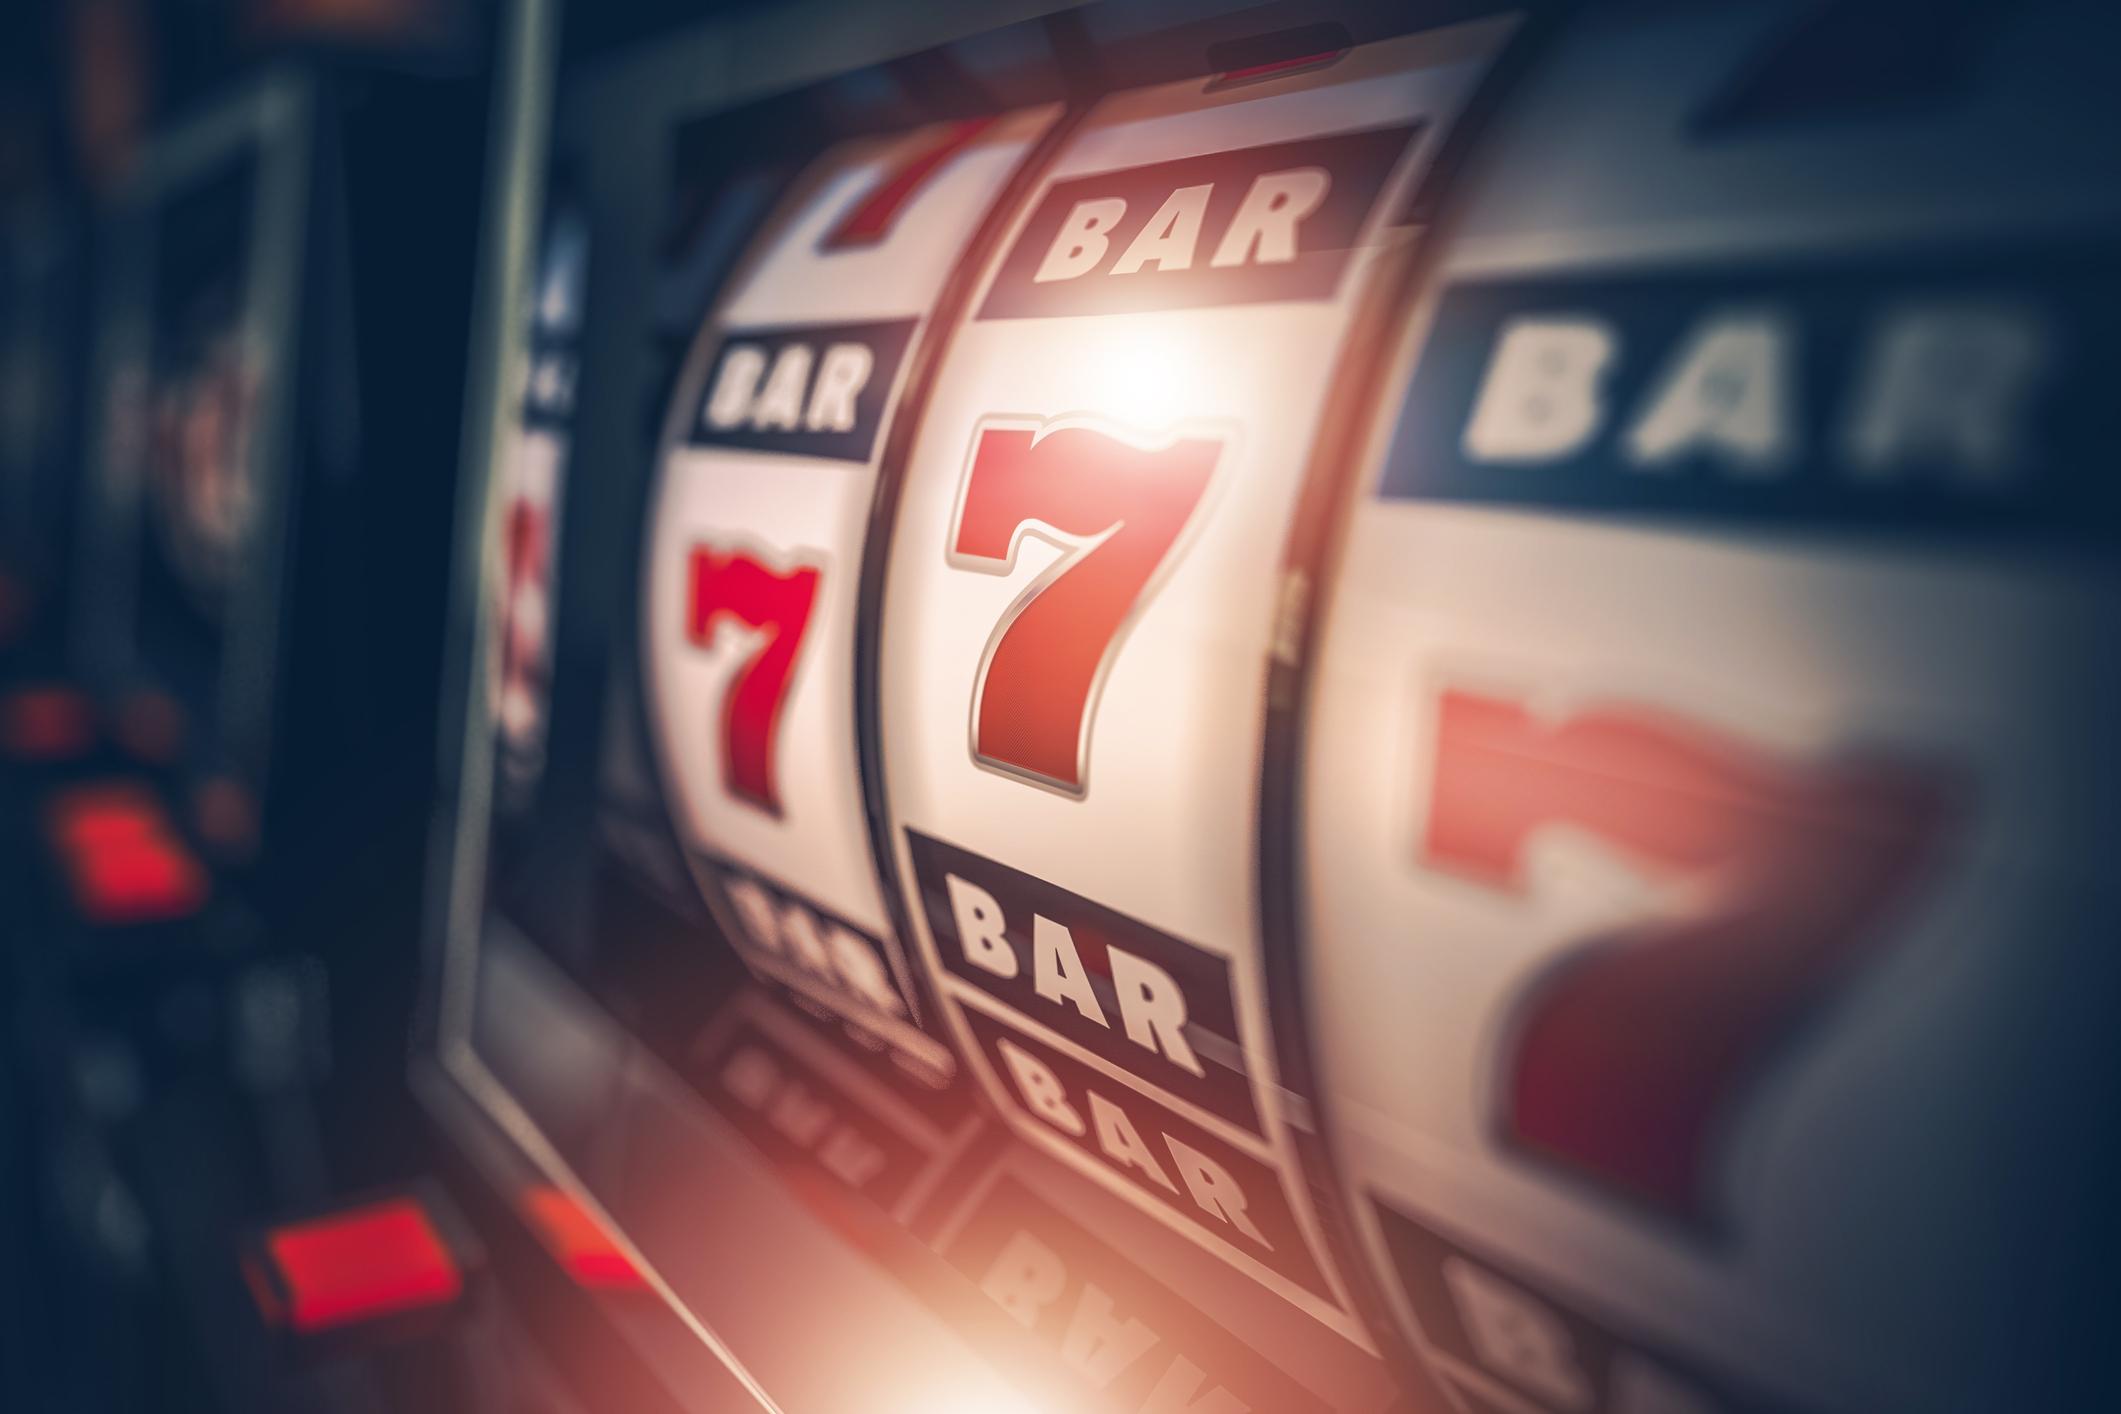 Slot machine shown in a casino.